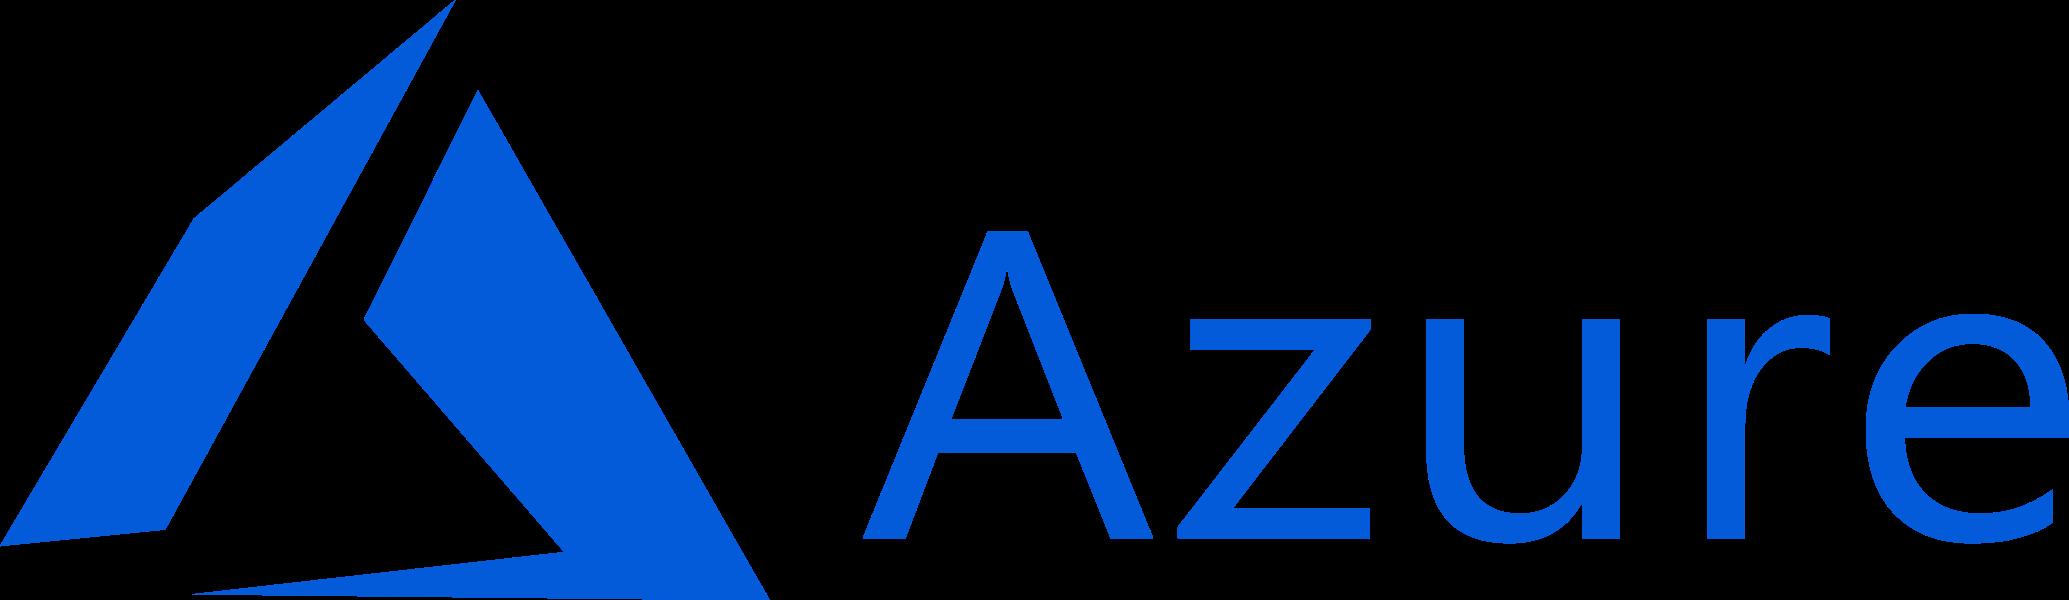 Microsoft_Azure-600